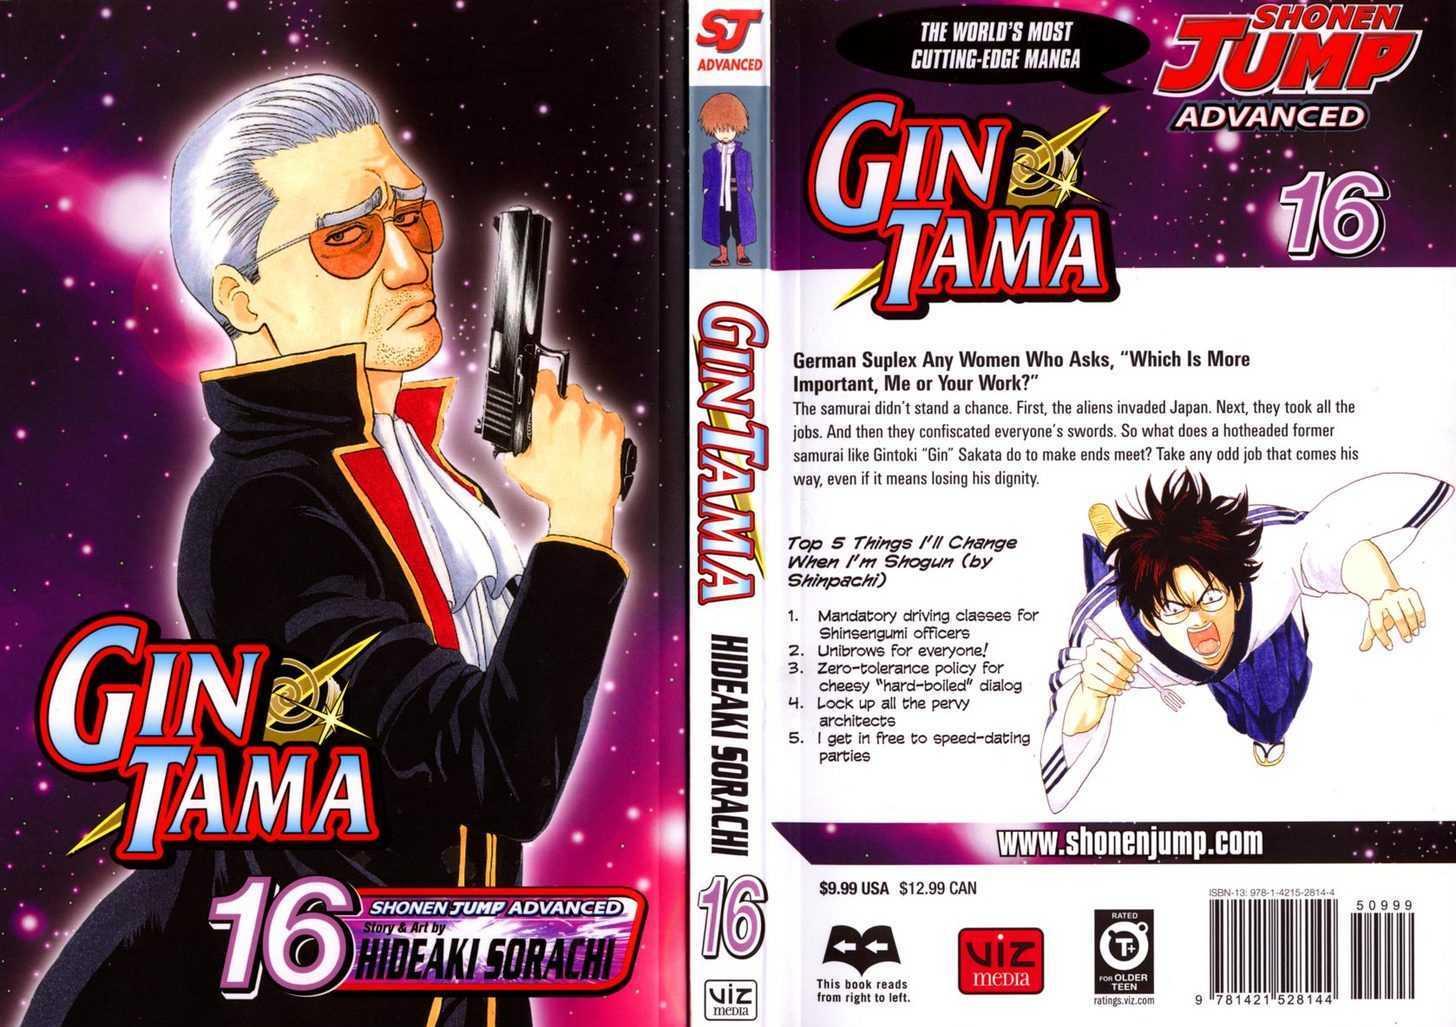 https://im.nineanime.com/comics/pic9/18/210/16603/Gintama1310201.jpg Page 1